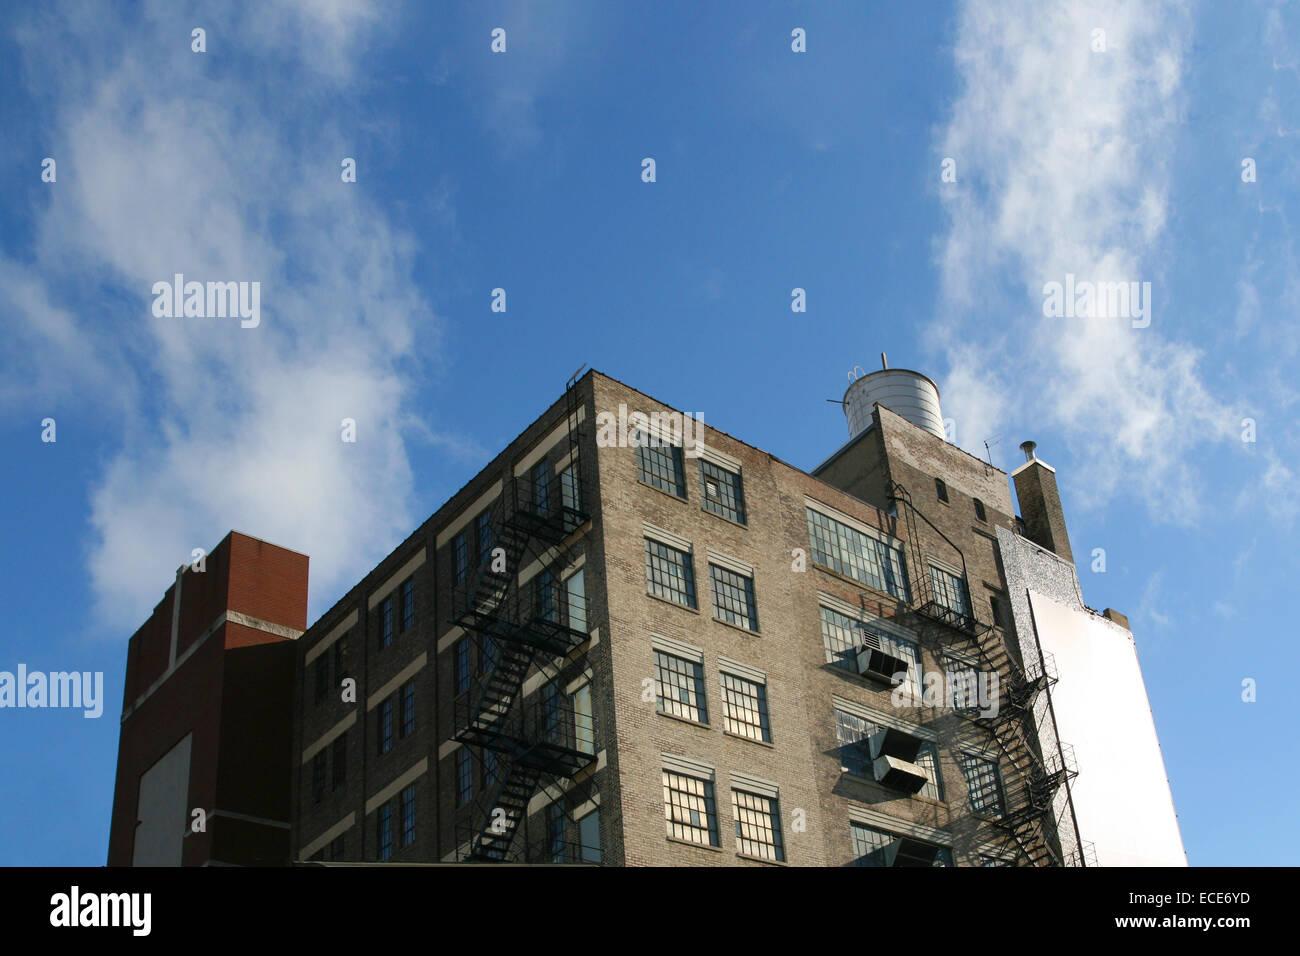 Backstein Gebaeude Feuerleiter Ziegel alt Himmel Freiraum Frei blau Industrie Haus Haeuser Fenster Bruechig bruechiges - Stock Image